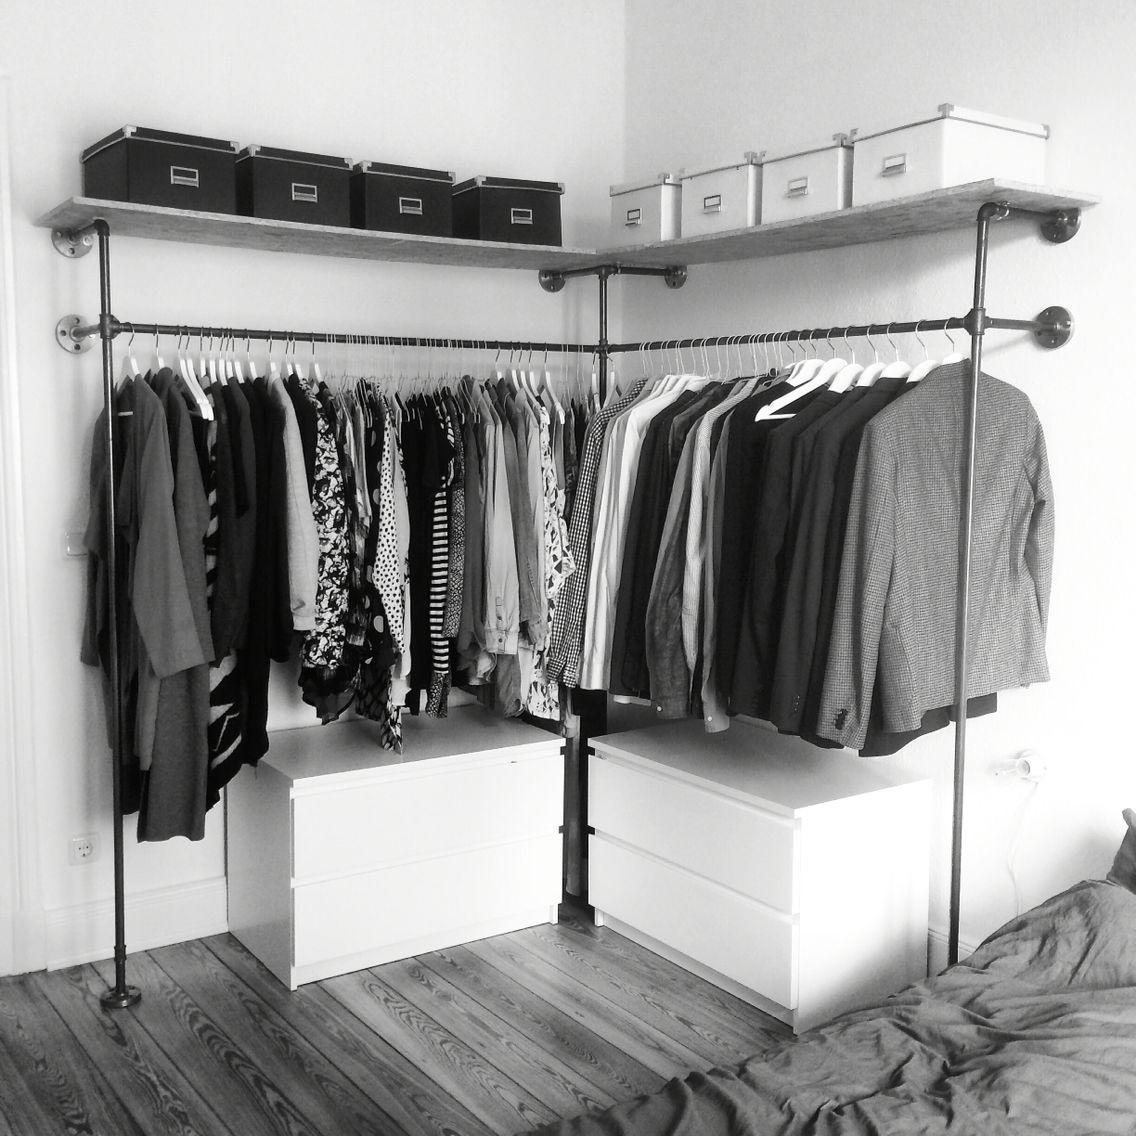 Offener Kleiderschrank Diy  Closet Aberto Veja aqui 22 ideias para te inspirar na